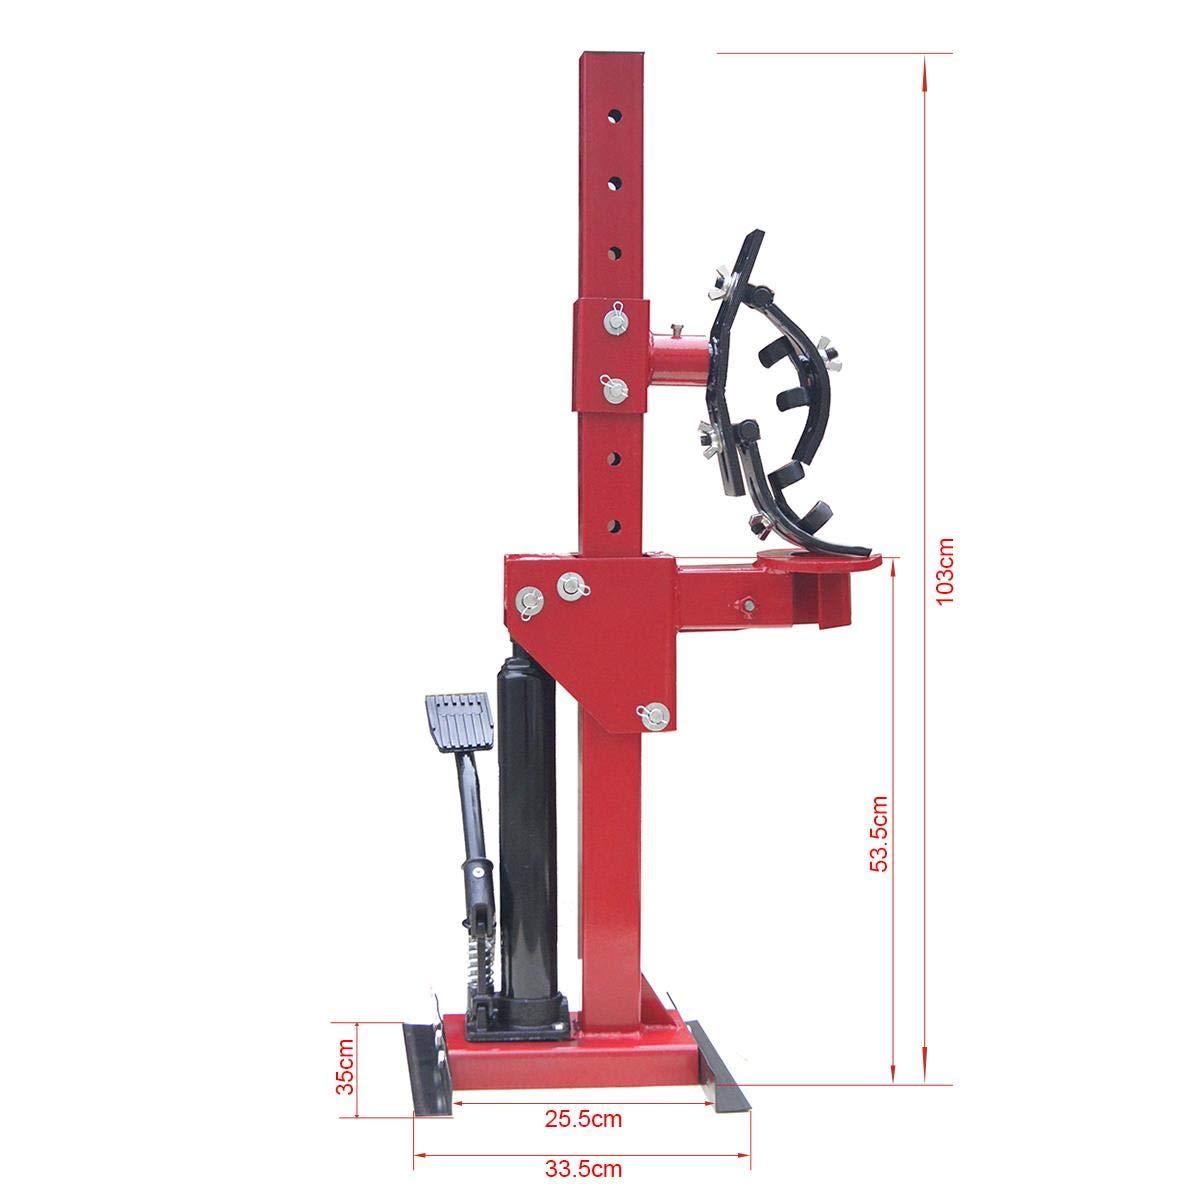 KATSU Hydraulic Car Spring Compressor 1 Ton